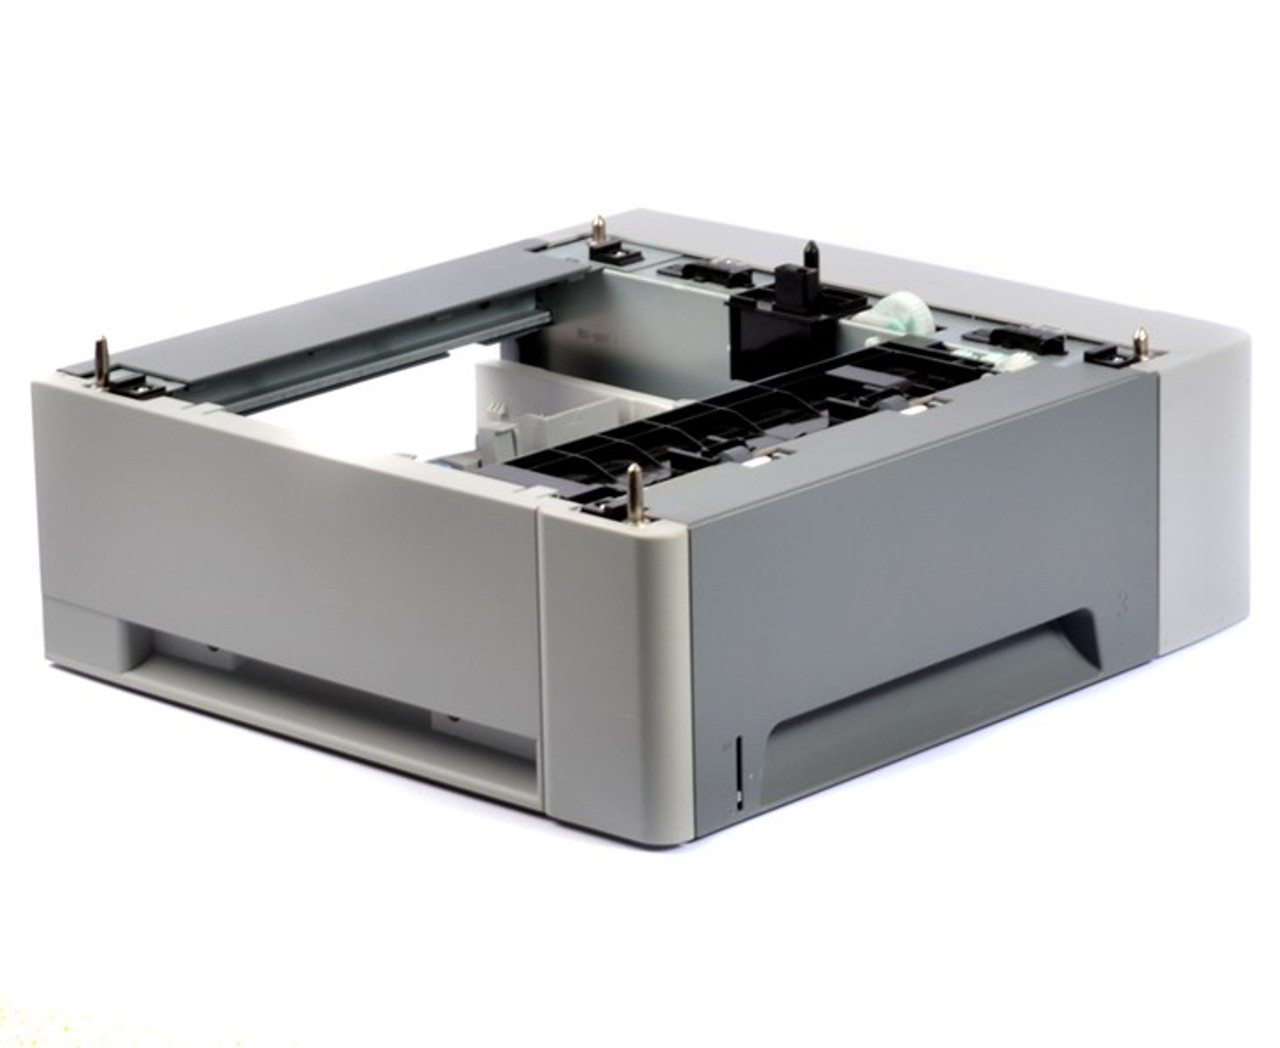 500 Sheet Optional 2420 Tray - HP LaserJet 2420 2430